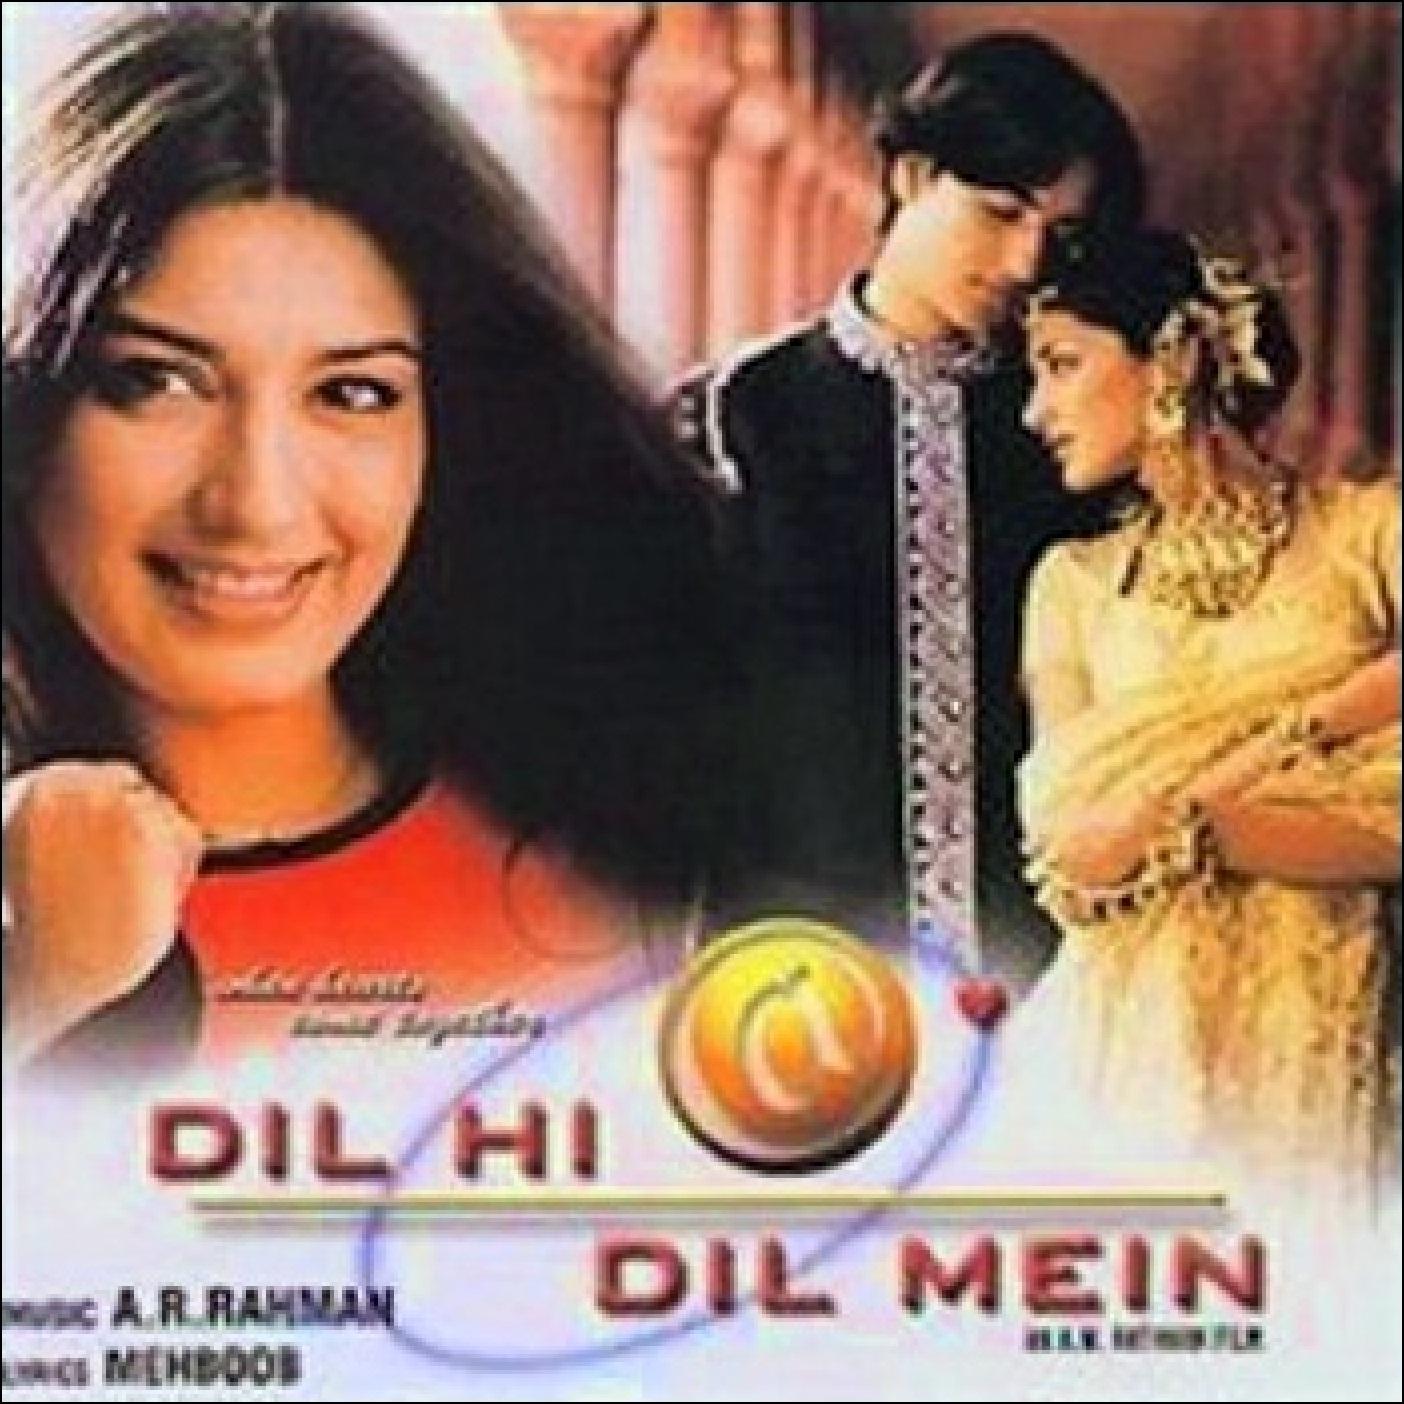 Dil Hi Dil Mein - Ae Naznee Suno Na Lyrics, Mp3 & Video